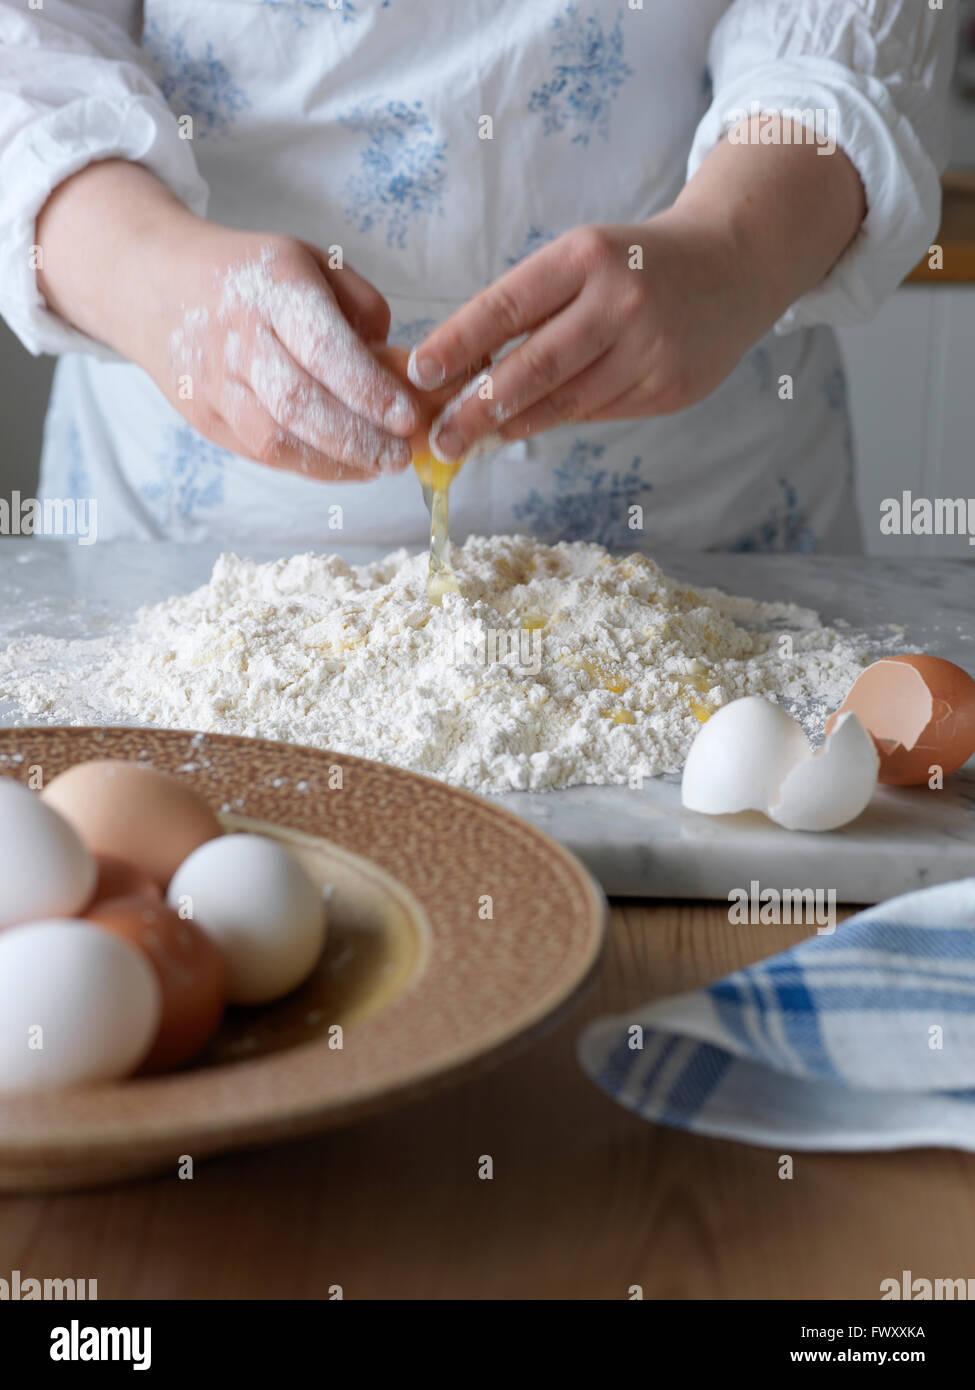 Sweden, Woman making pasta dough - Stock Image